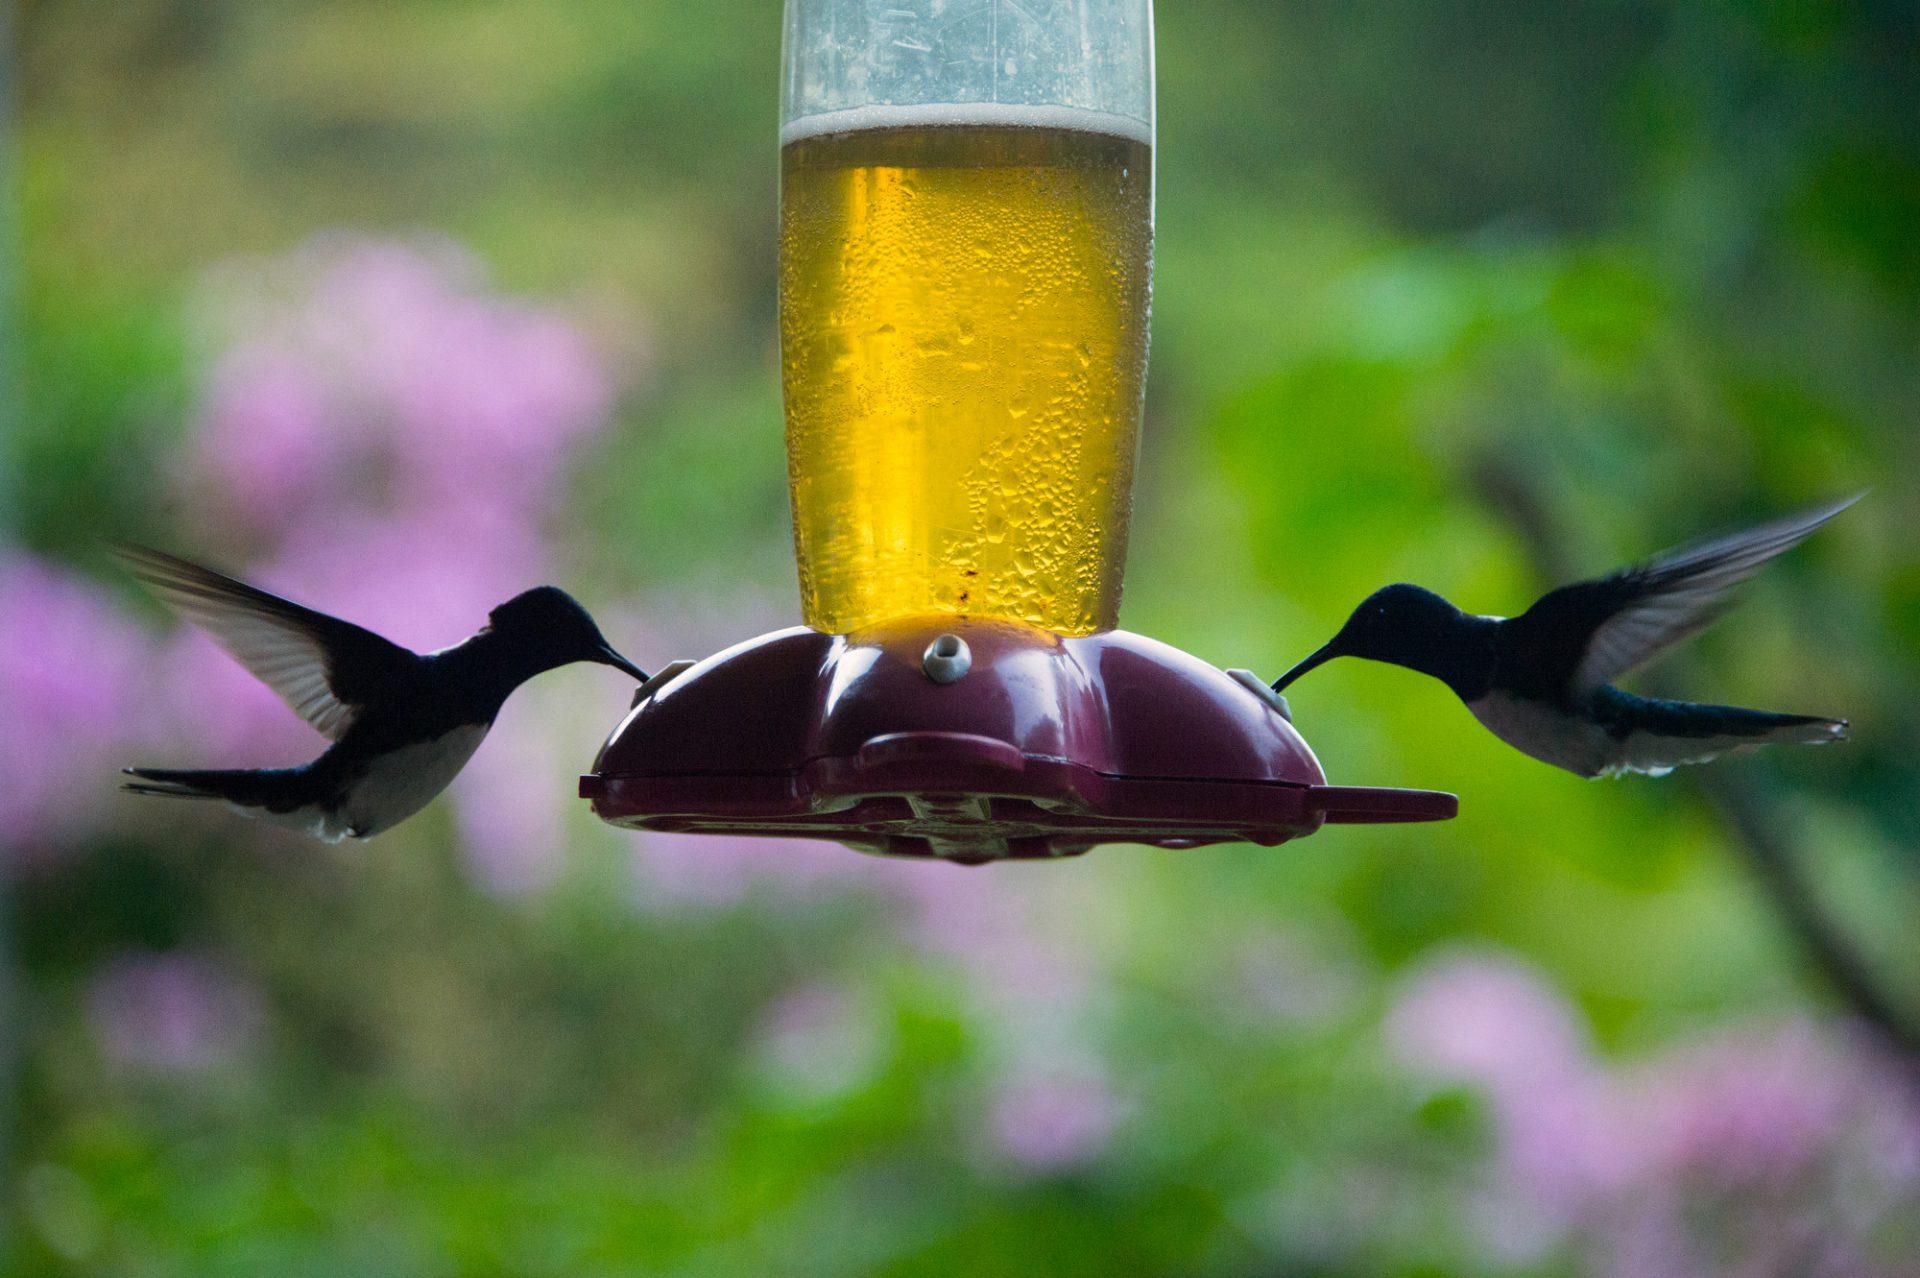 Photo: White-naped jacobin hummingbirds (Florisuga mellivora) from the wild in Gamboa, Panama.